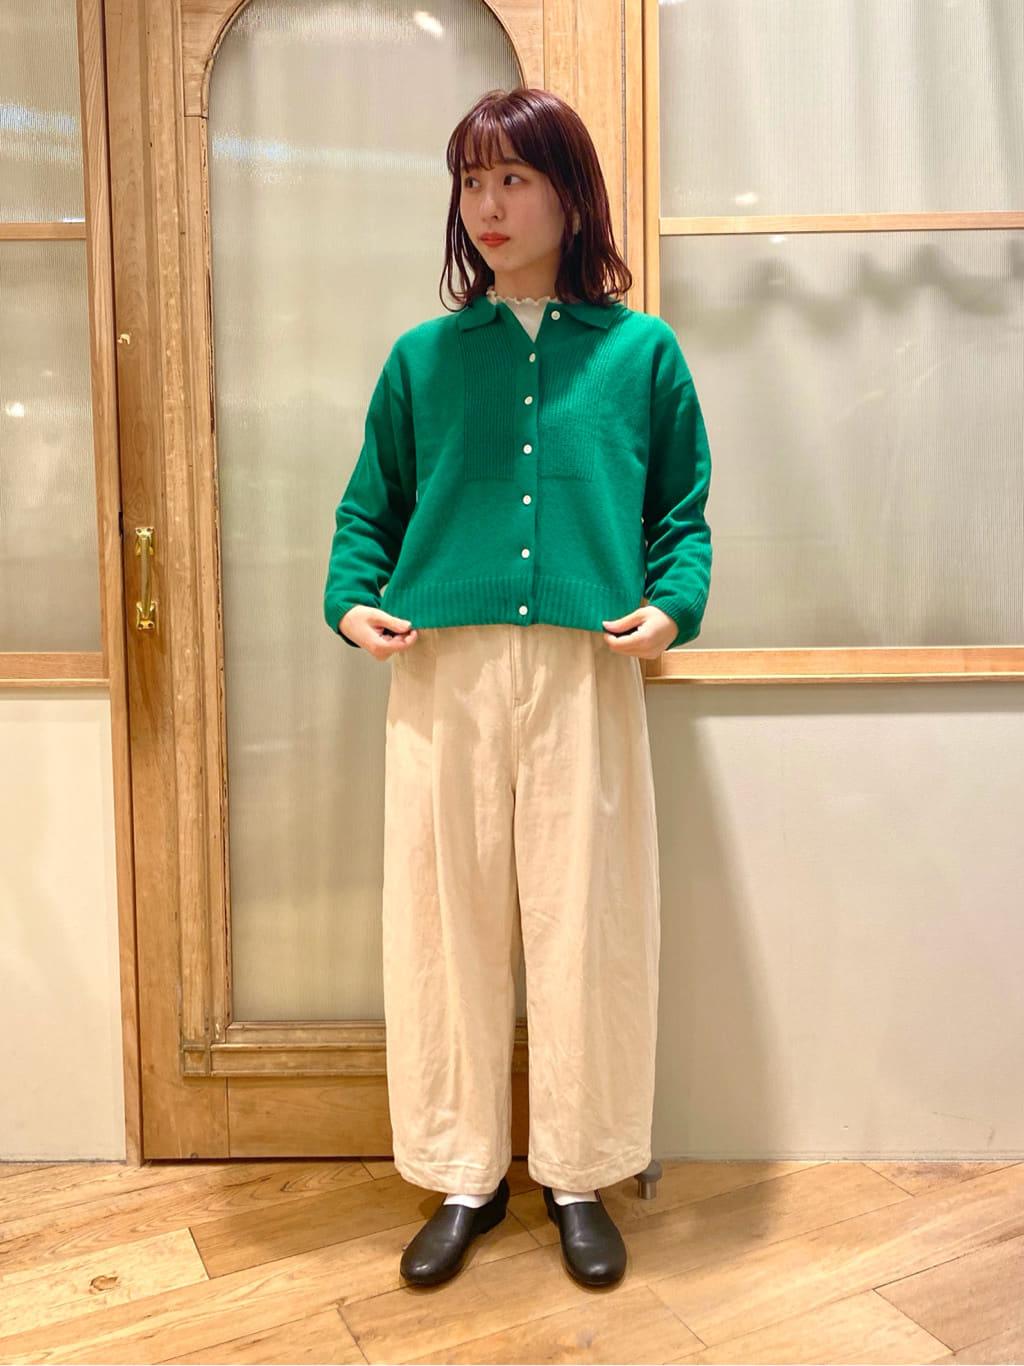 bulle de savon 新宿ミロード 身長:157cm 2021.09.11